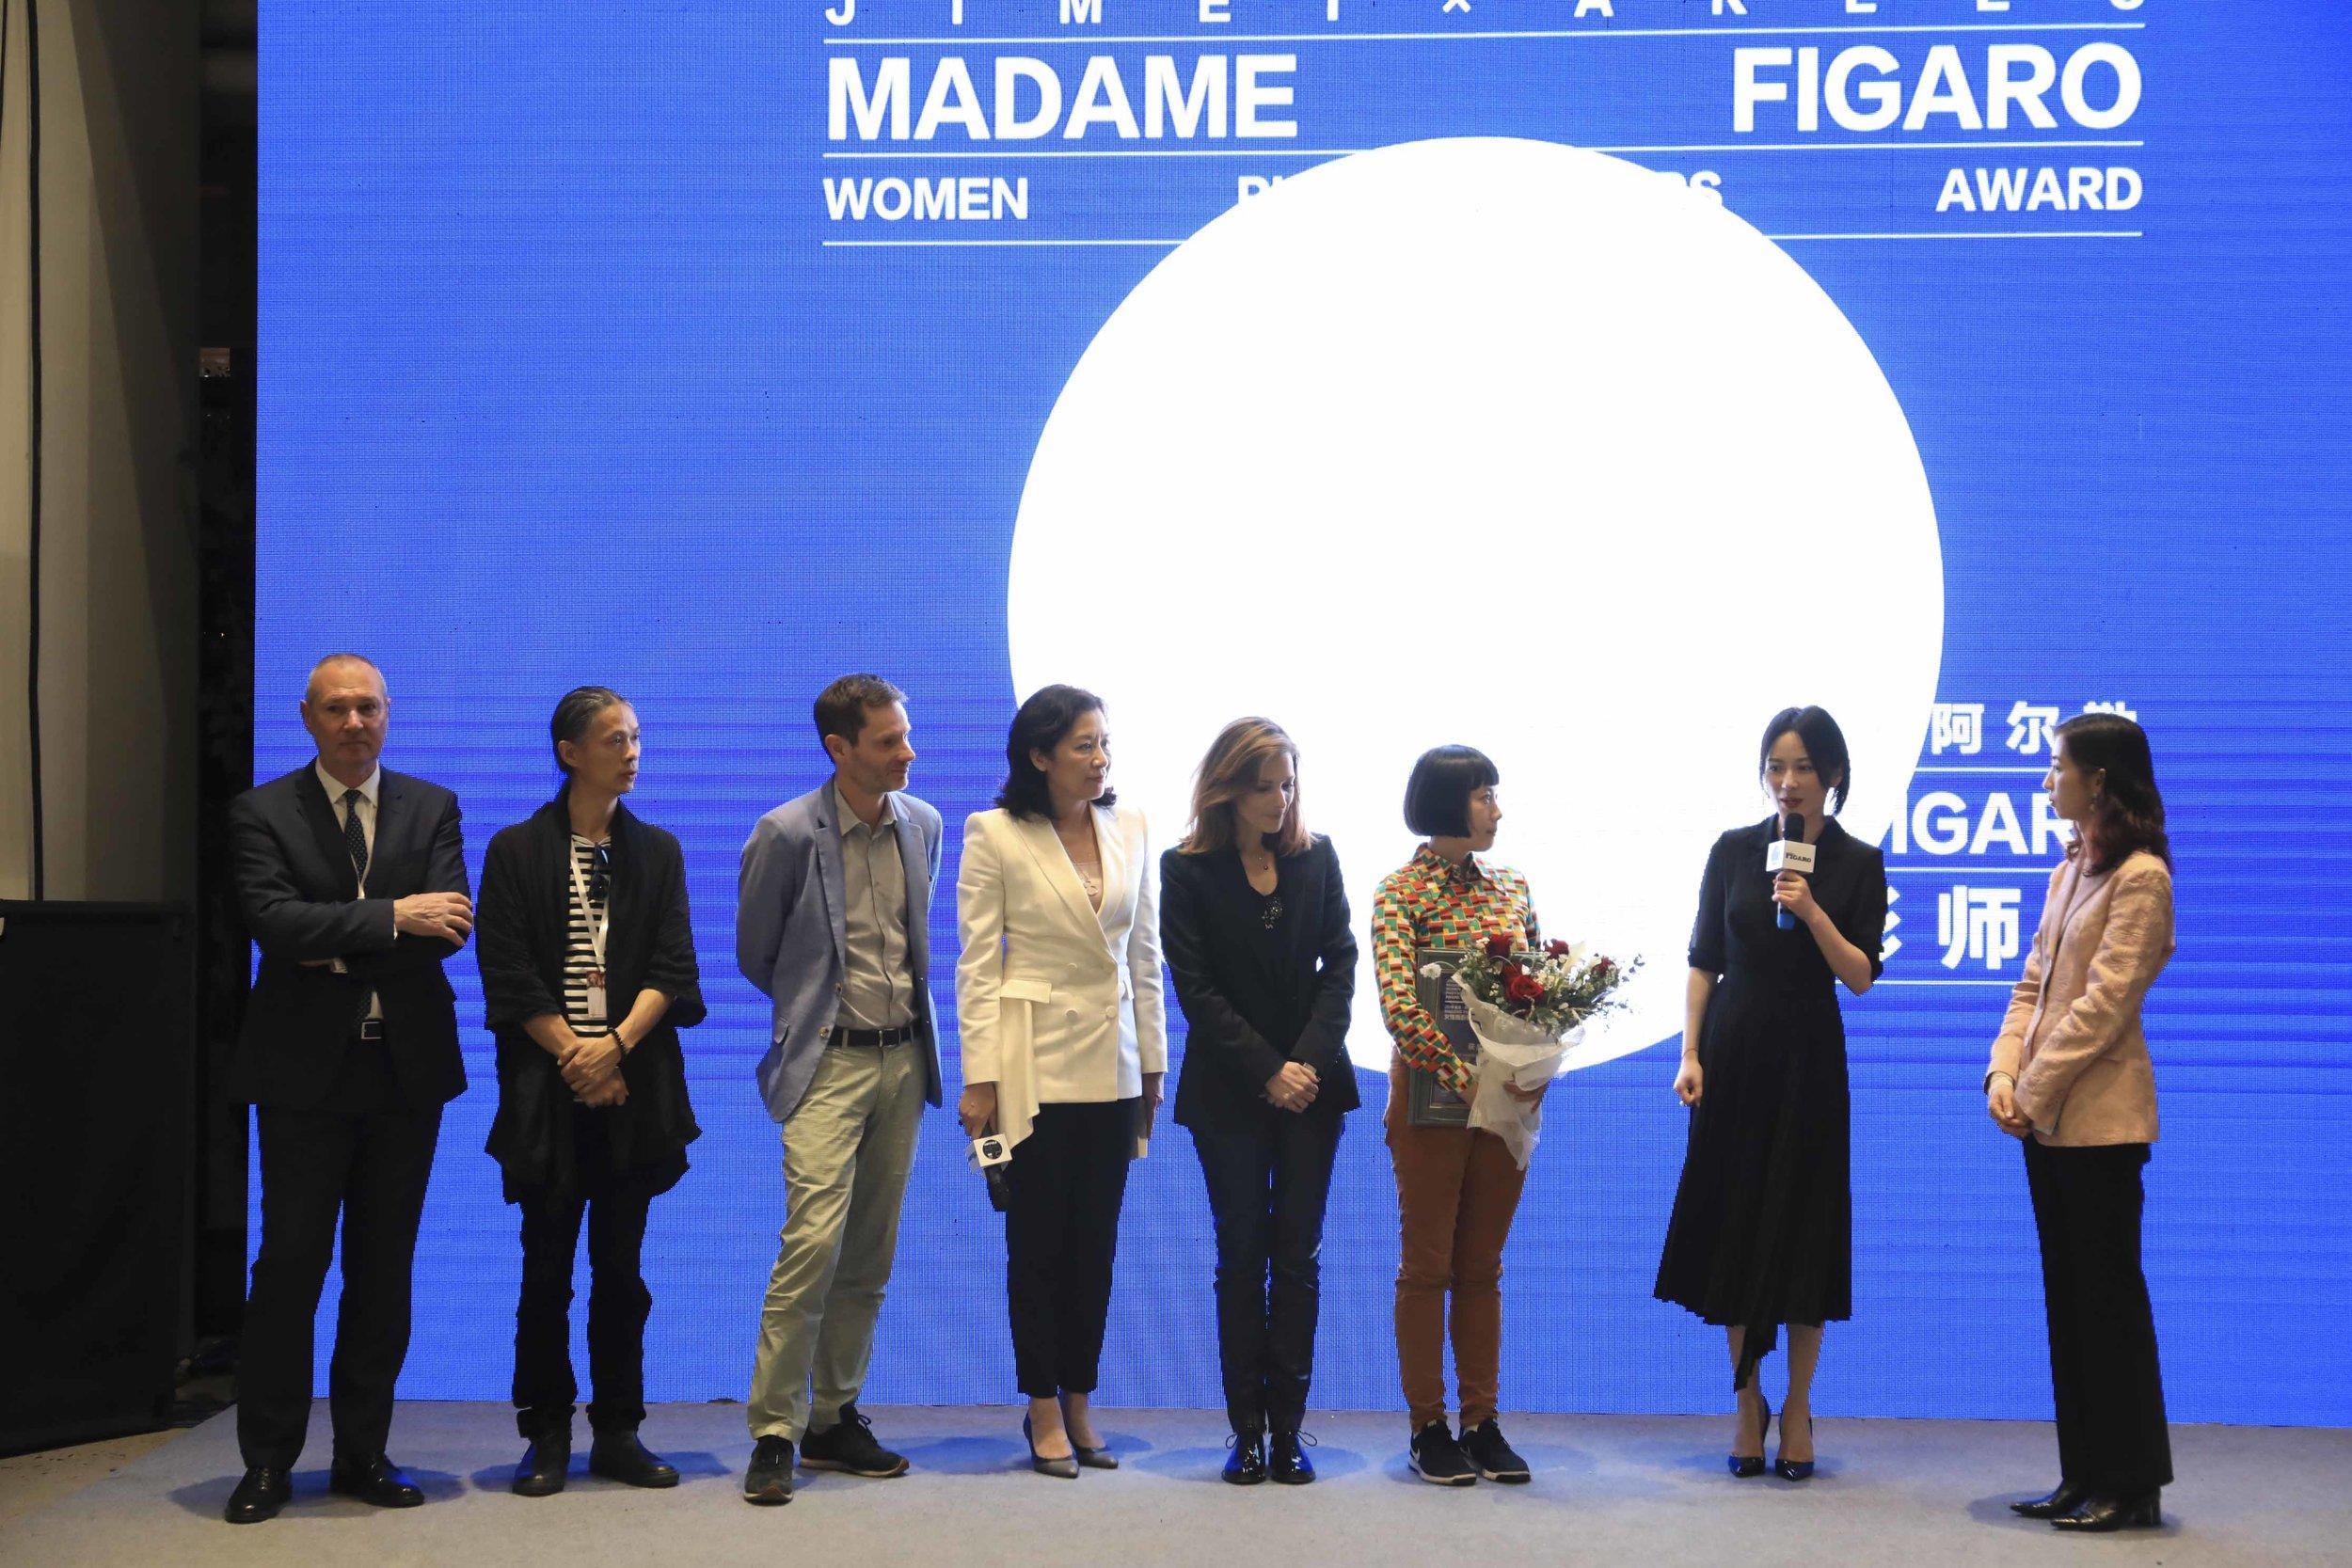 From left to right: Jean-Sébastien Stehli, RongRong, Sam Stourdzé, Cai Jinqing, Yaël Blic-Ripert, Pixy Liao, Yu Feihong, Liu Feifei